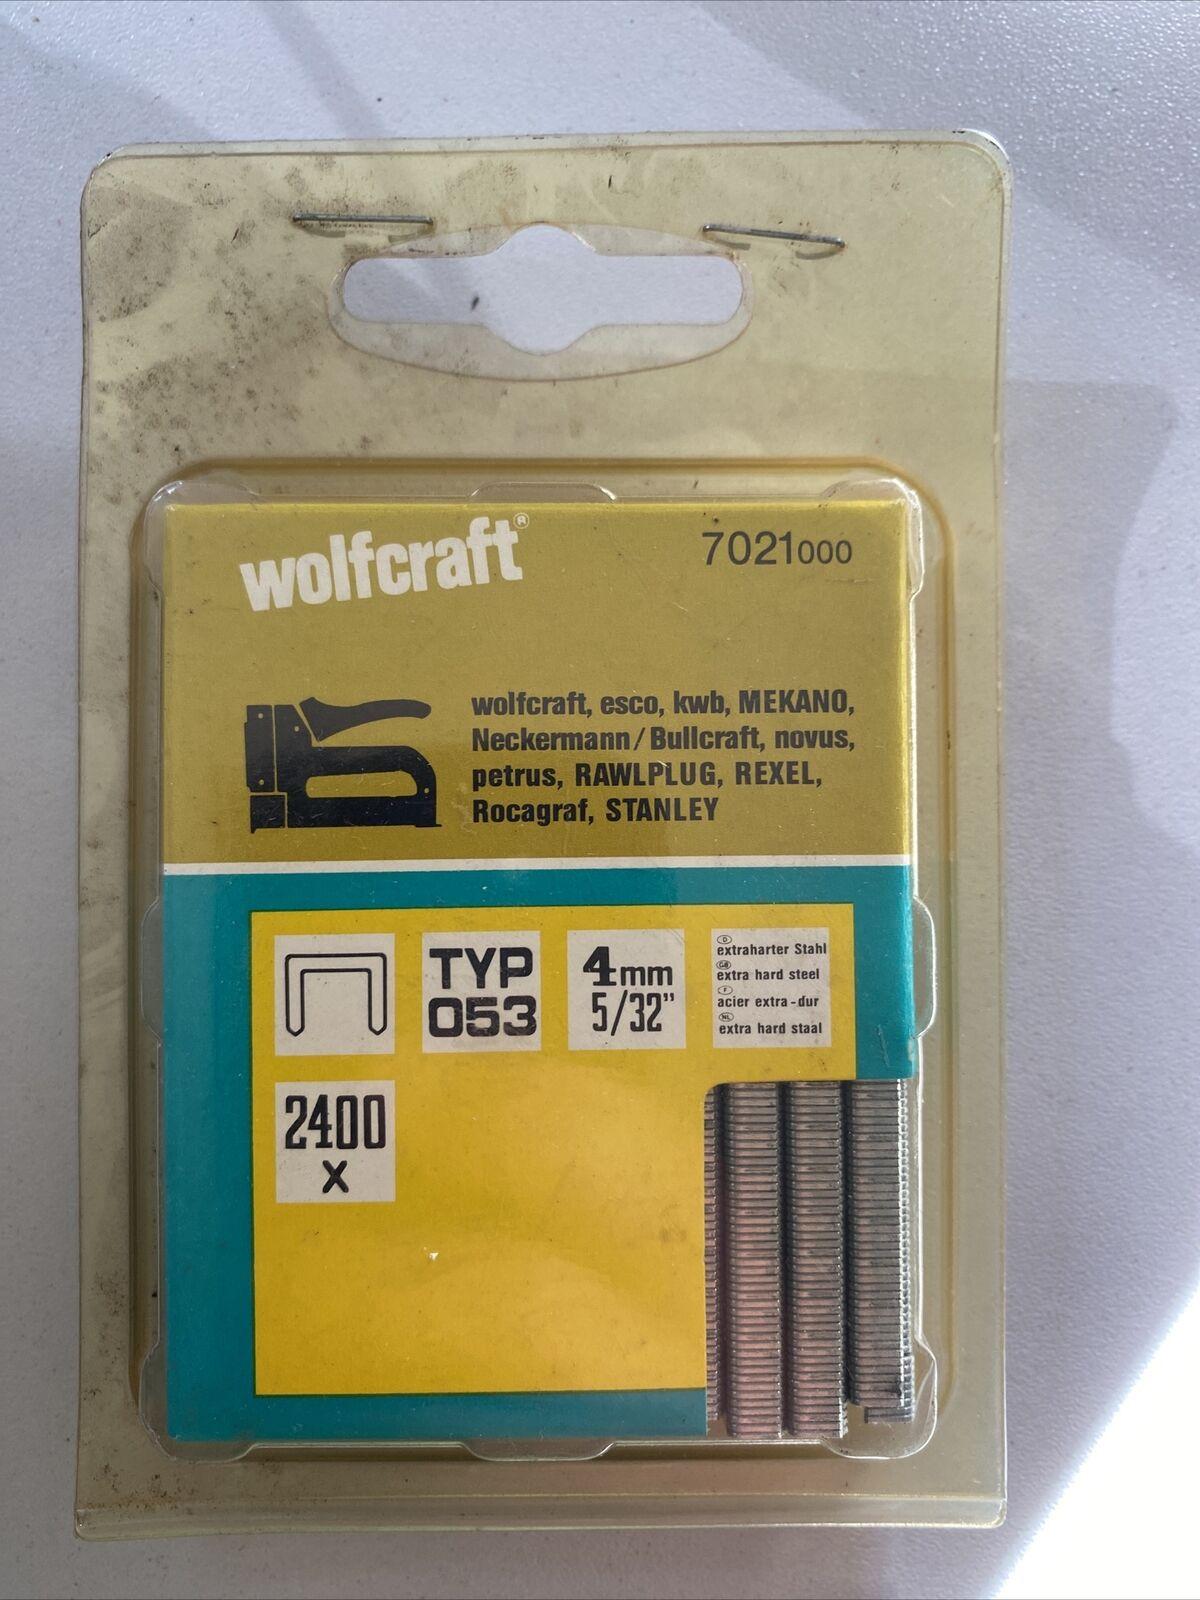 Paréntesis grapas wolfcraft 7021 000 tipo 053 4 mm 2400 unidades